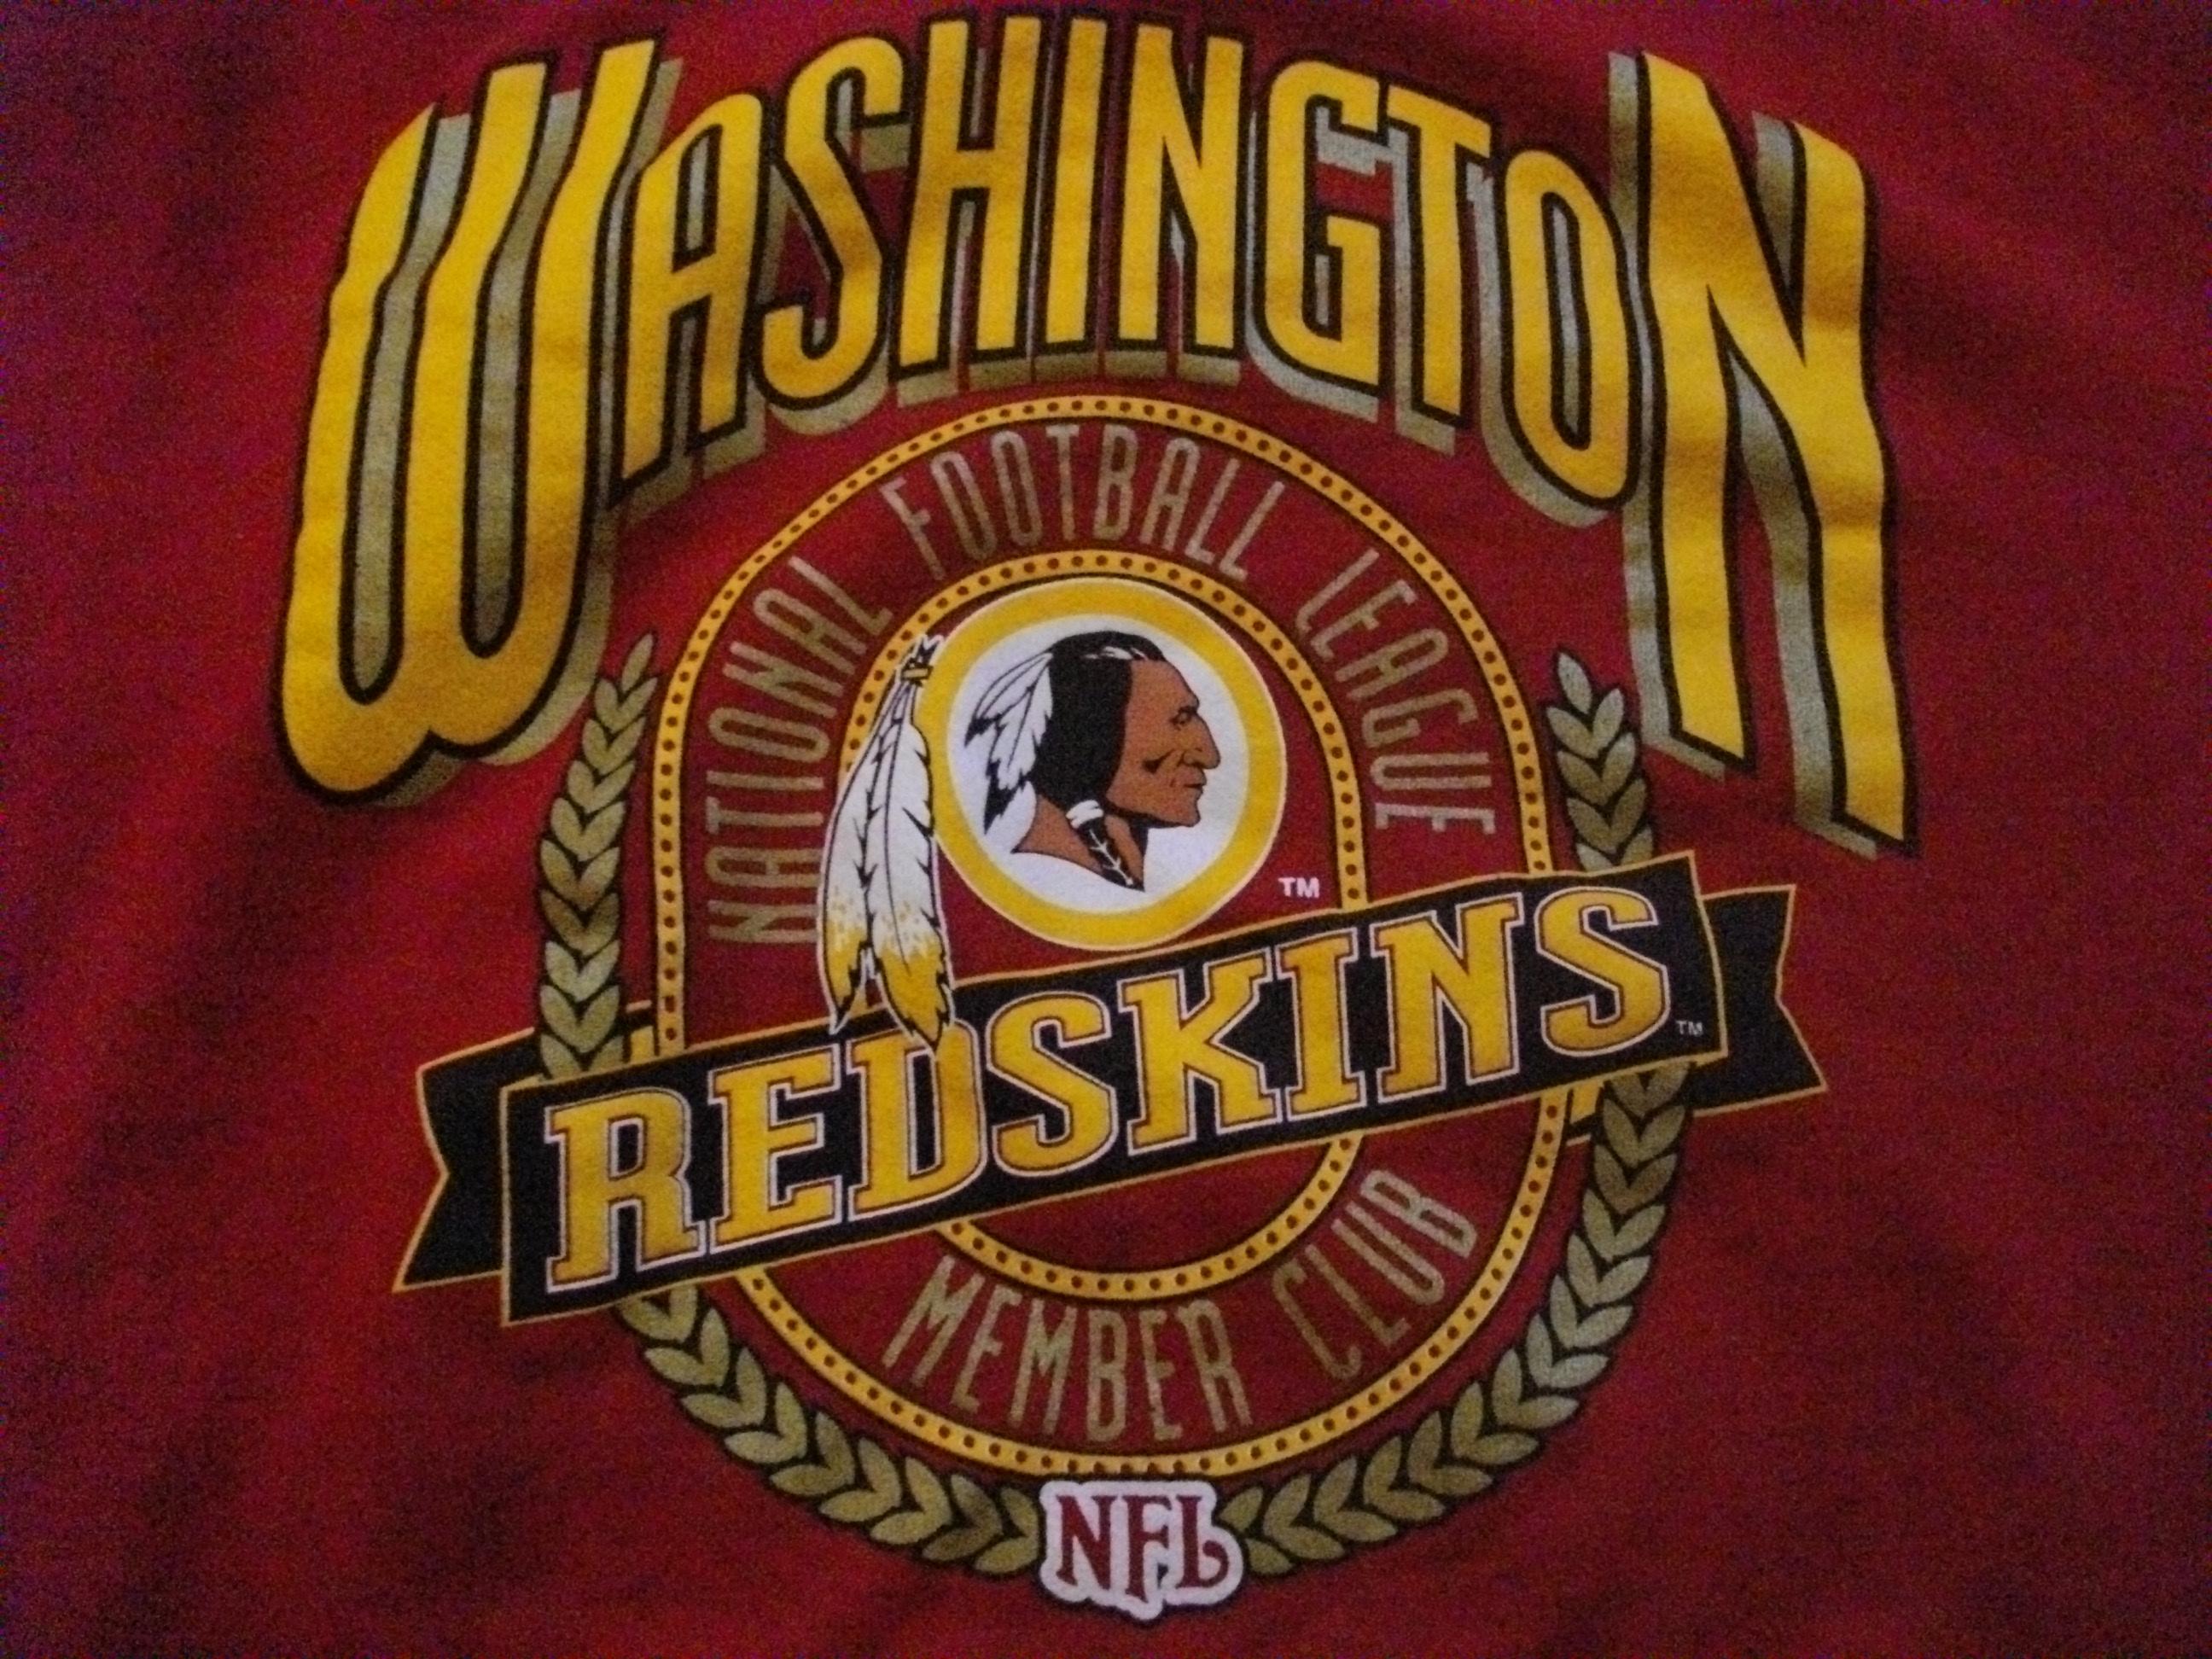 WASHINGTON REDSKINS nfl football rq JPG wallpaper 2592x1944 155247 2592x1944